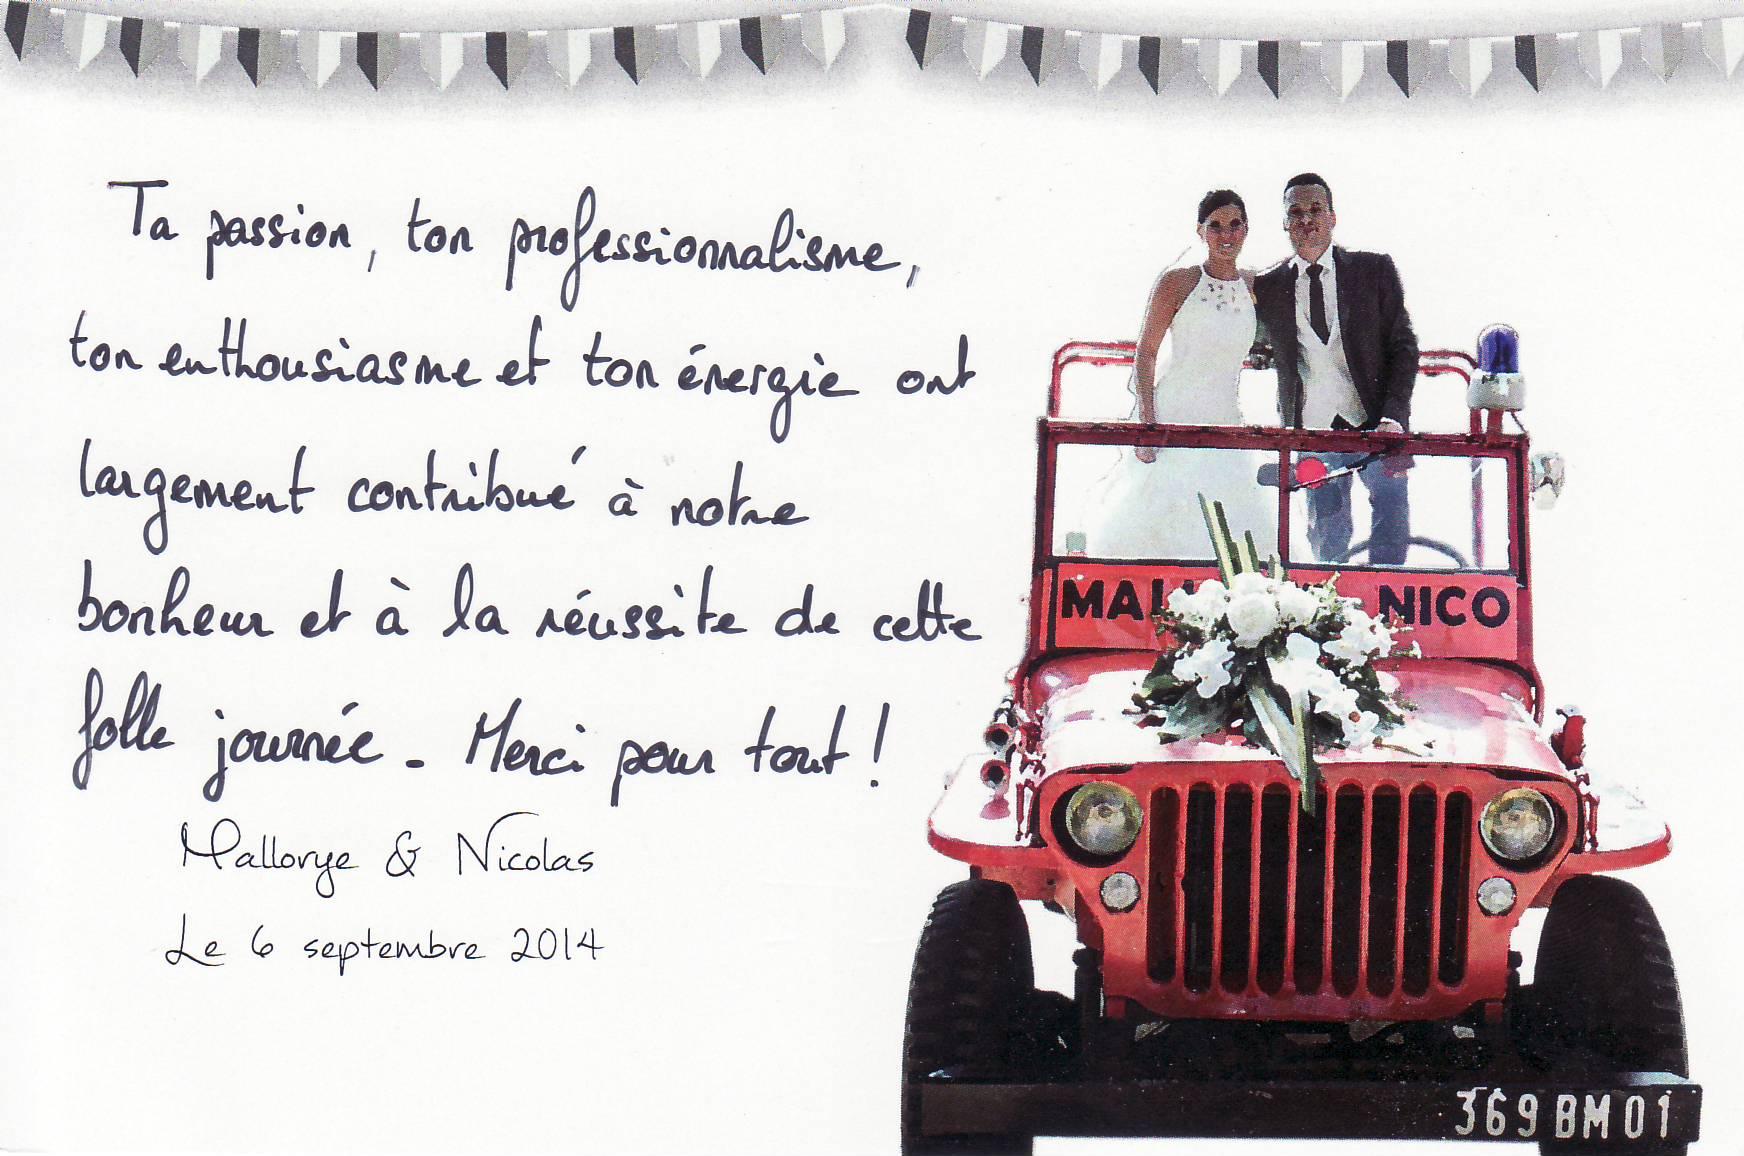 Mariage FOLLET Nicolas & Mallorye (Domaine de Divonne) (06-09-2014) 2.JPG